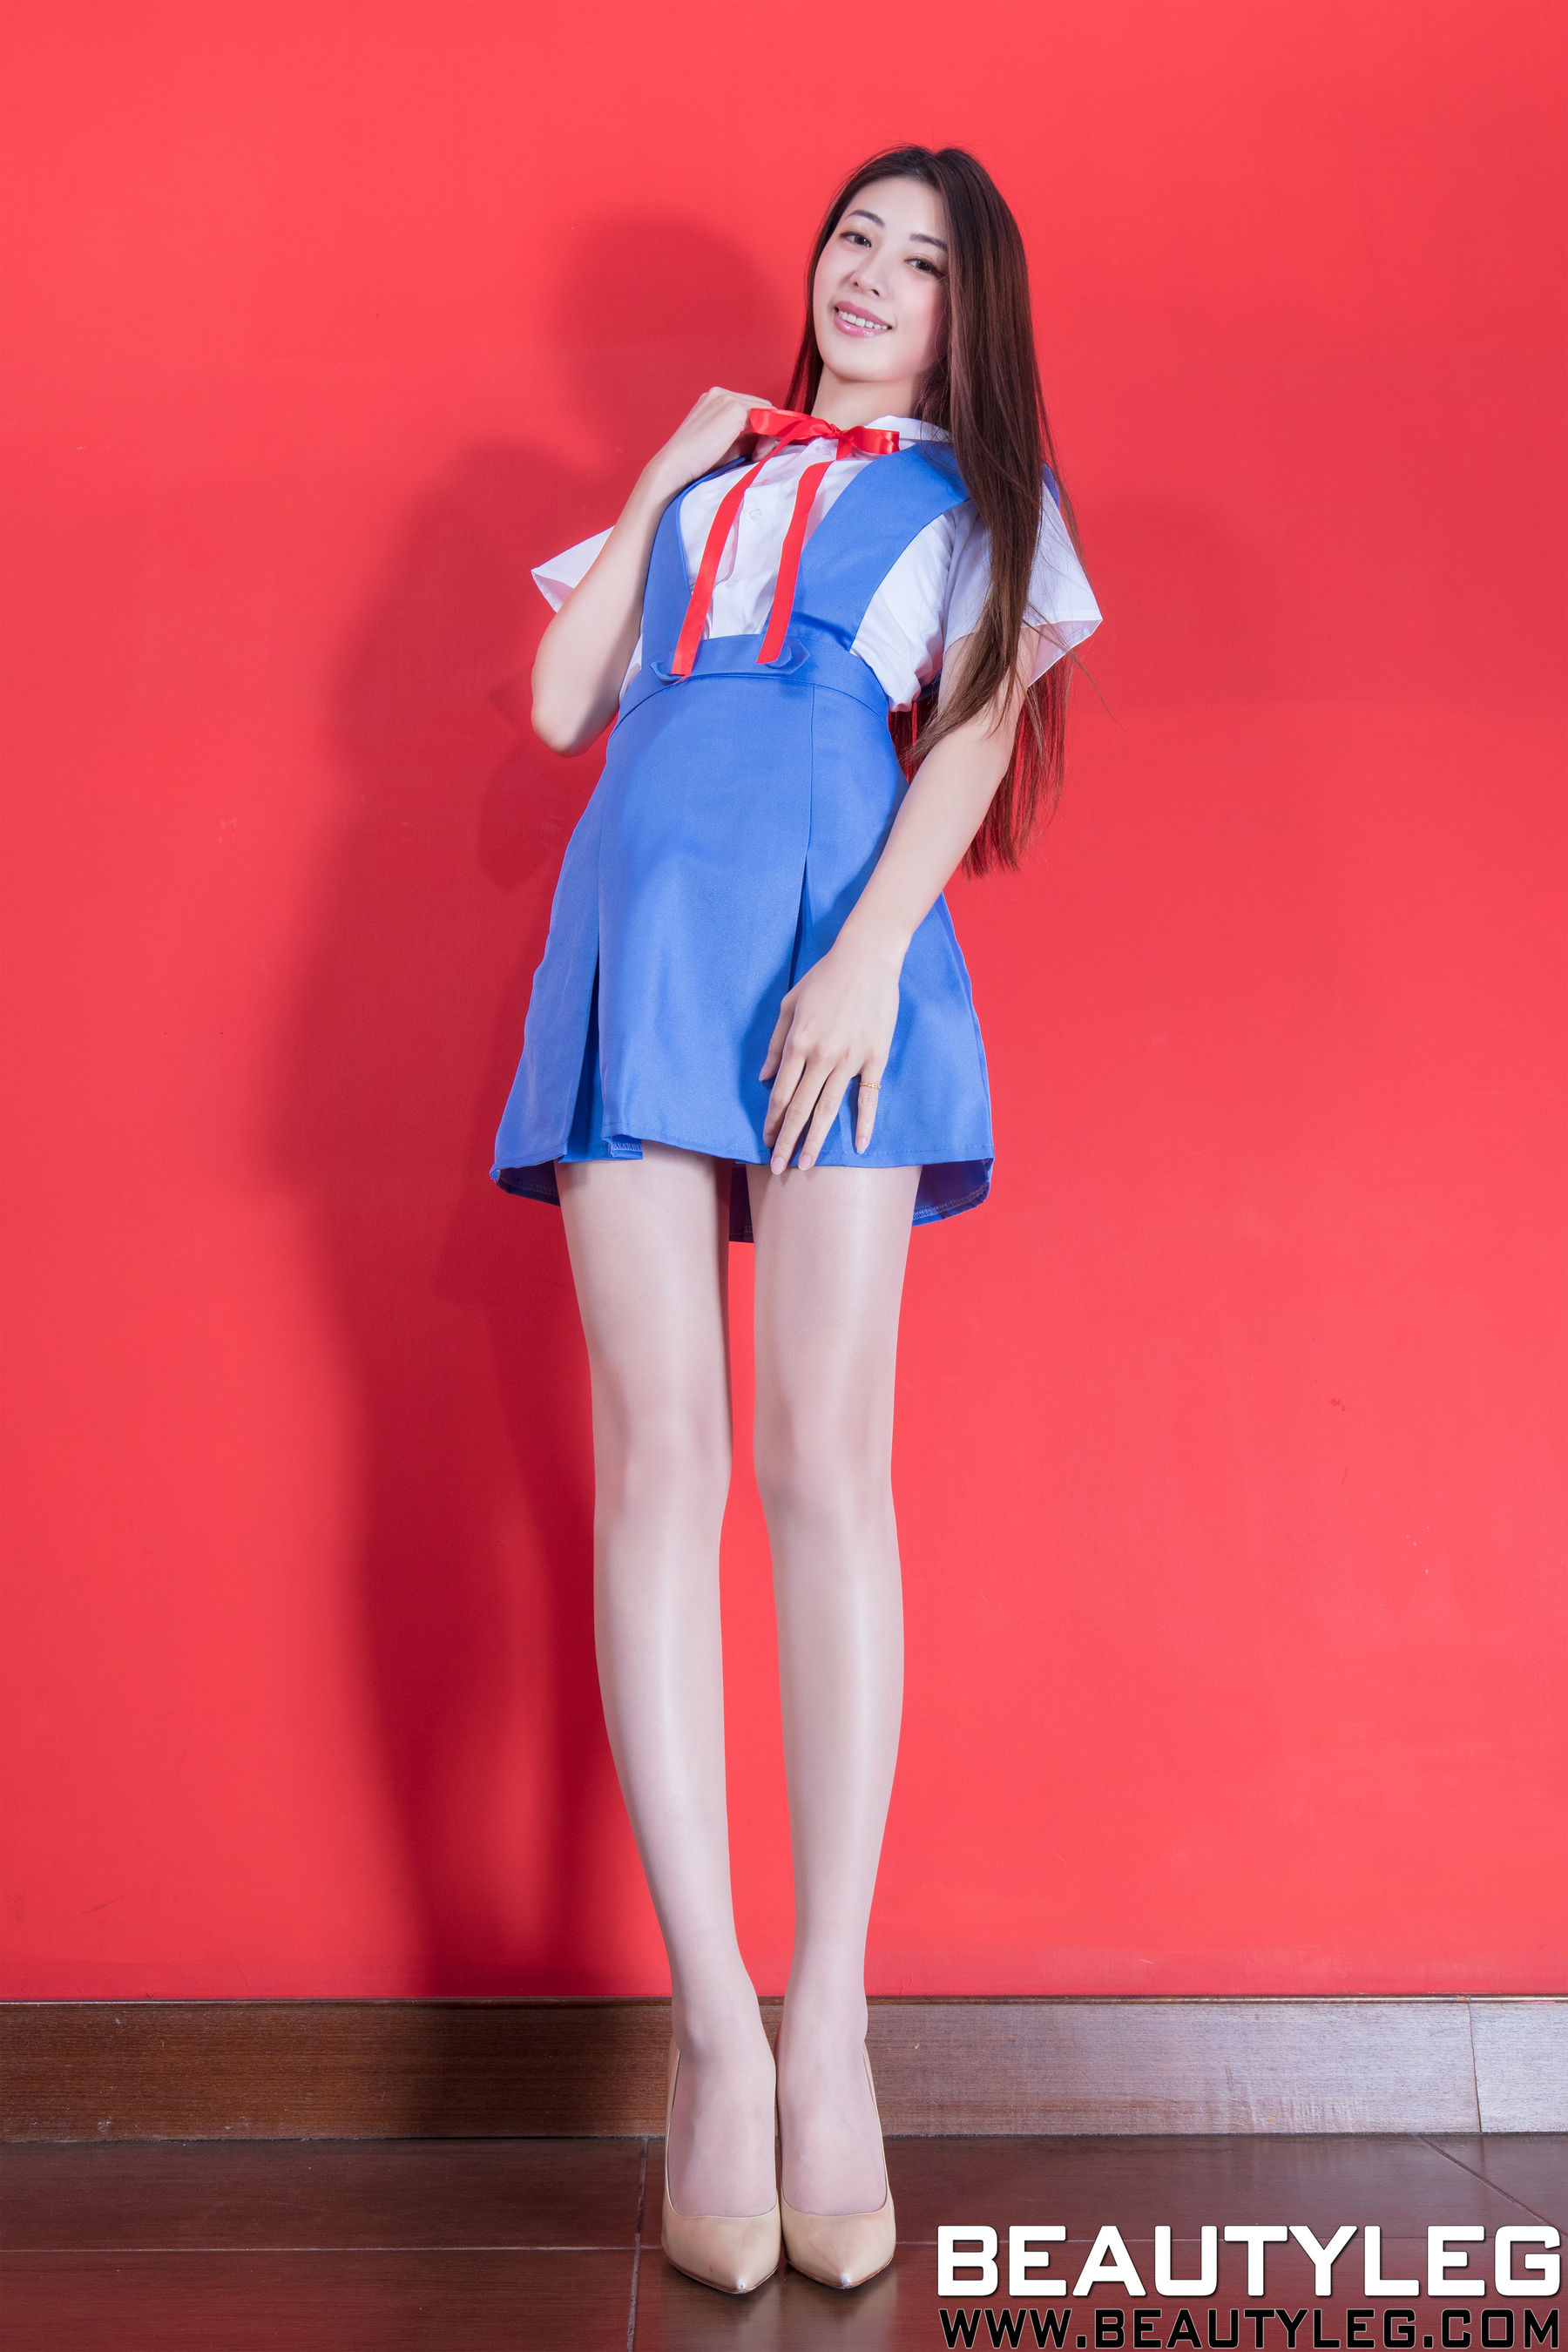 VOL.1626 [Beautyleg]丝袜美女美腿肉丝袜:蔡茵茵(腿模Flora)超高清个人性感漂亮大图(49P)